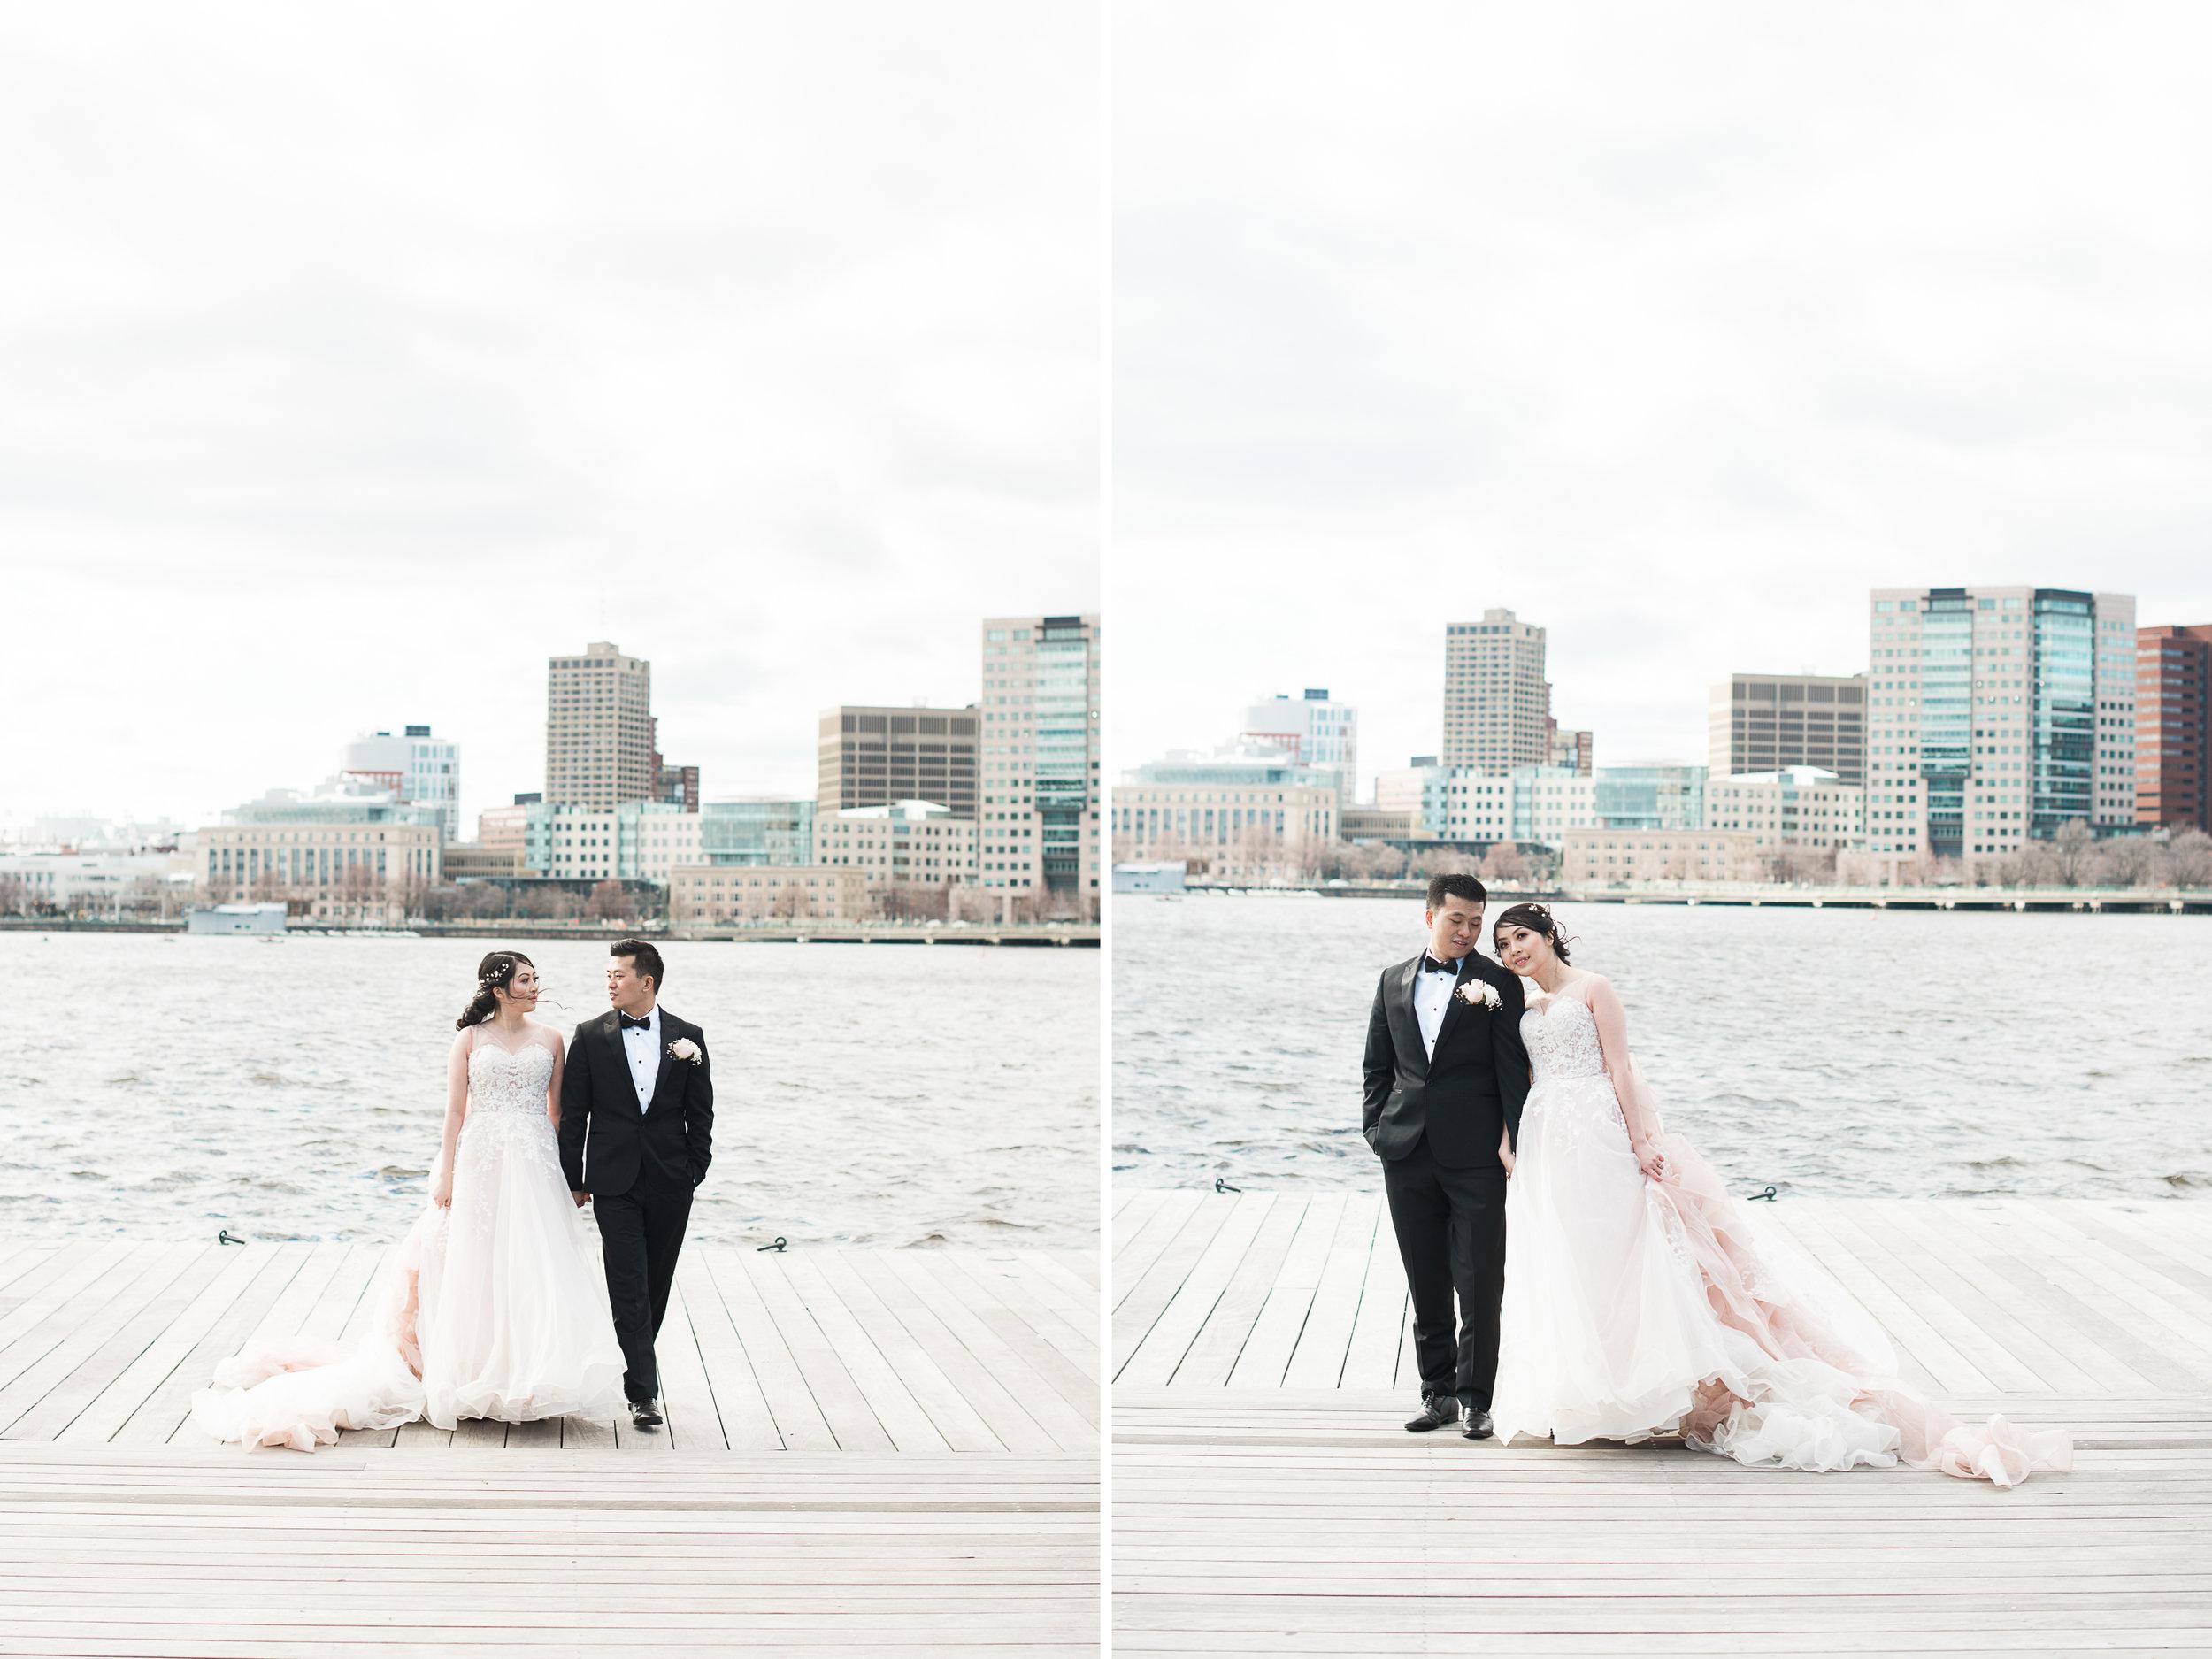 Wedding Photographers near The North Shore